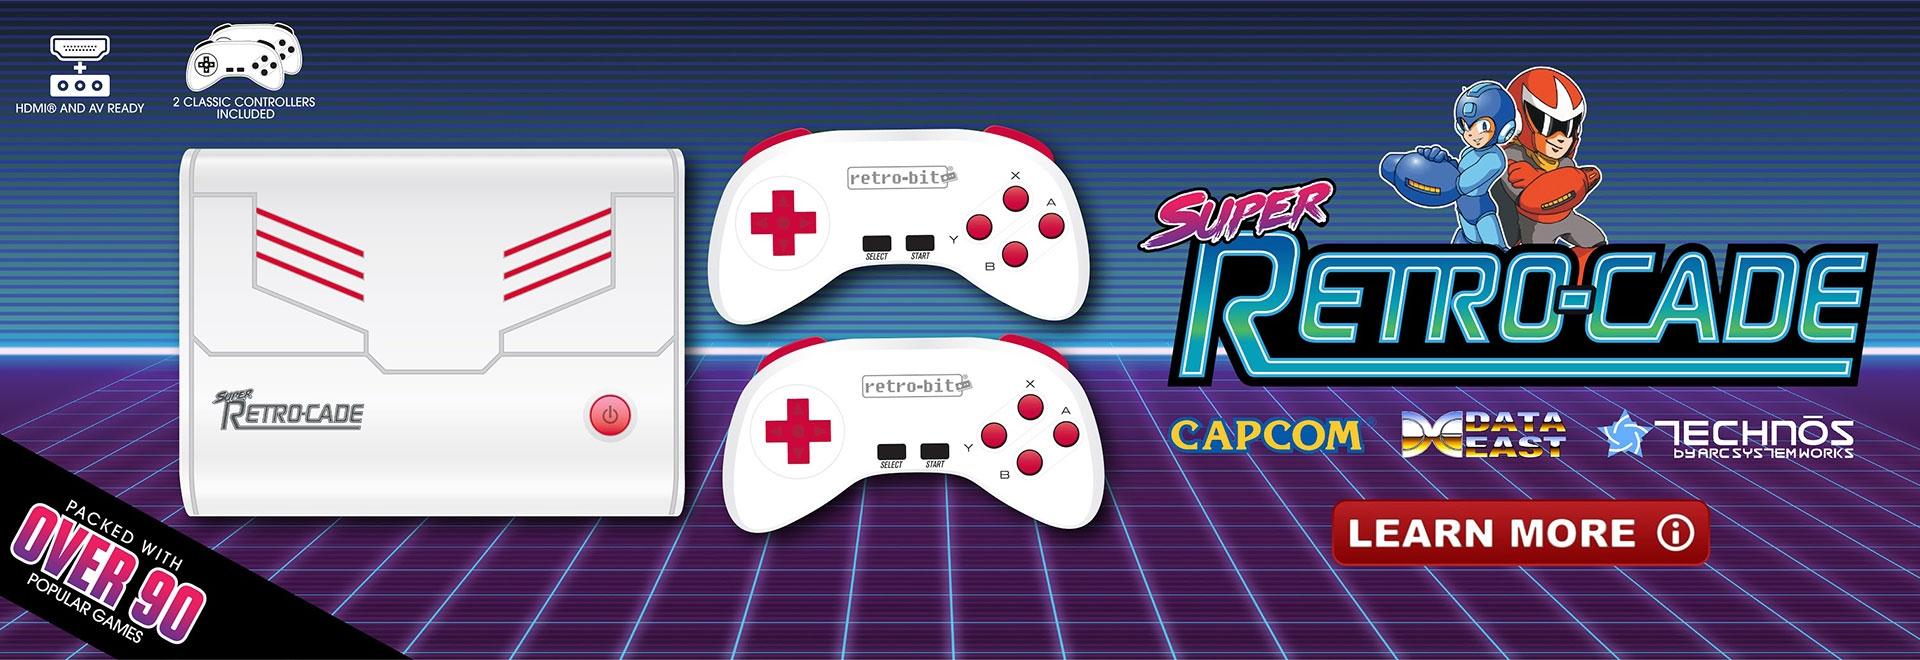 Retro-Bit Super Retro-Cade